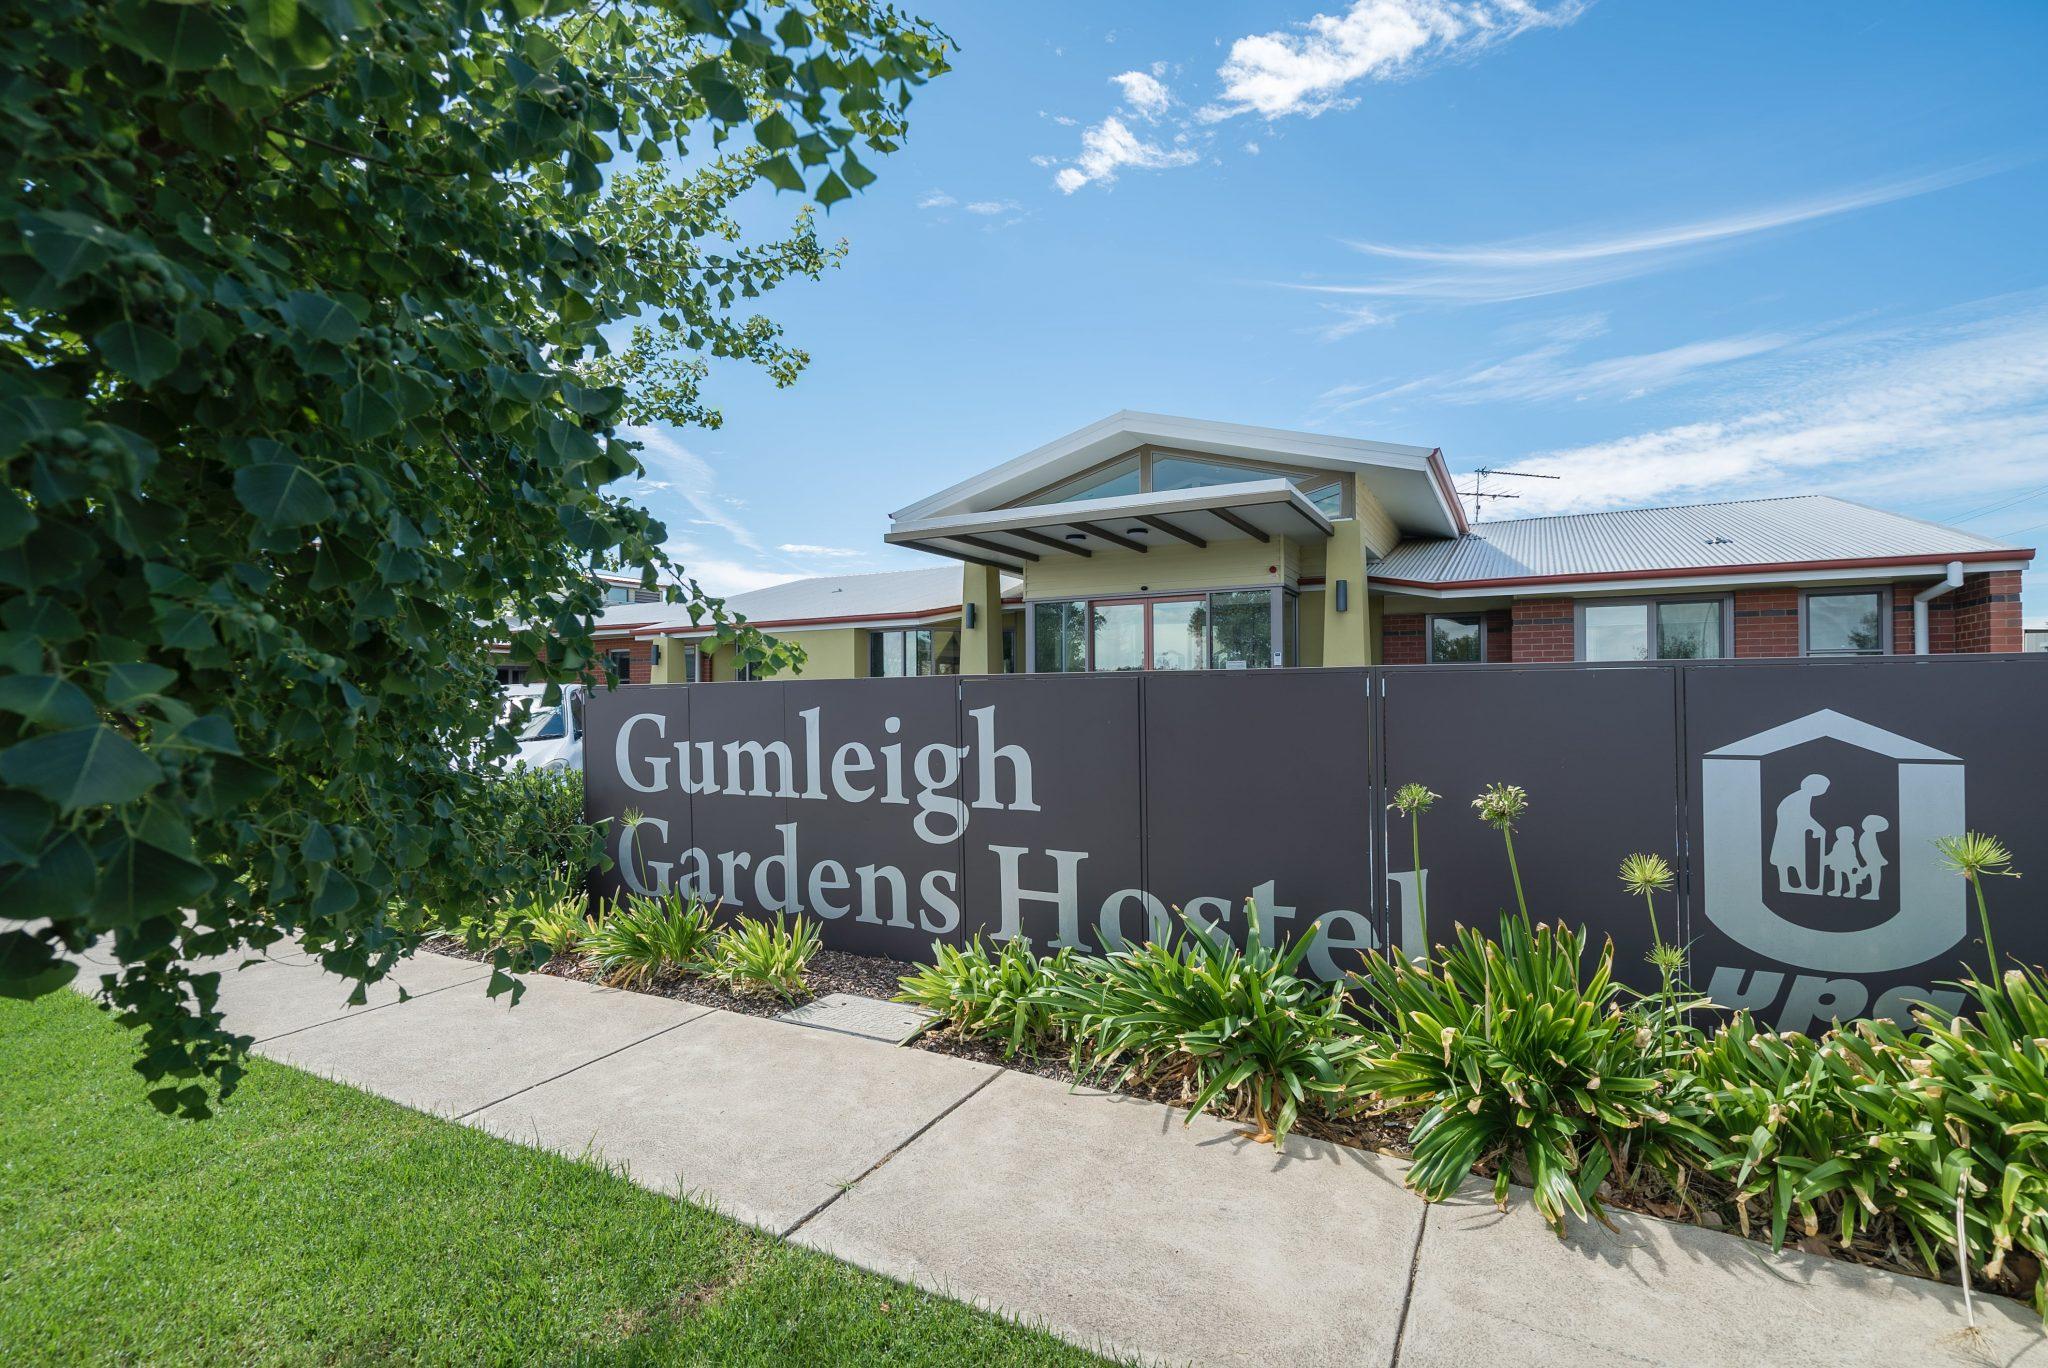 Gumleigh Gardens Hostel - Wagga Wagga - Riverina